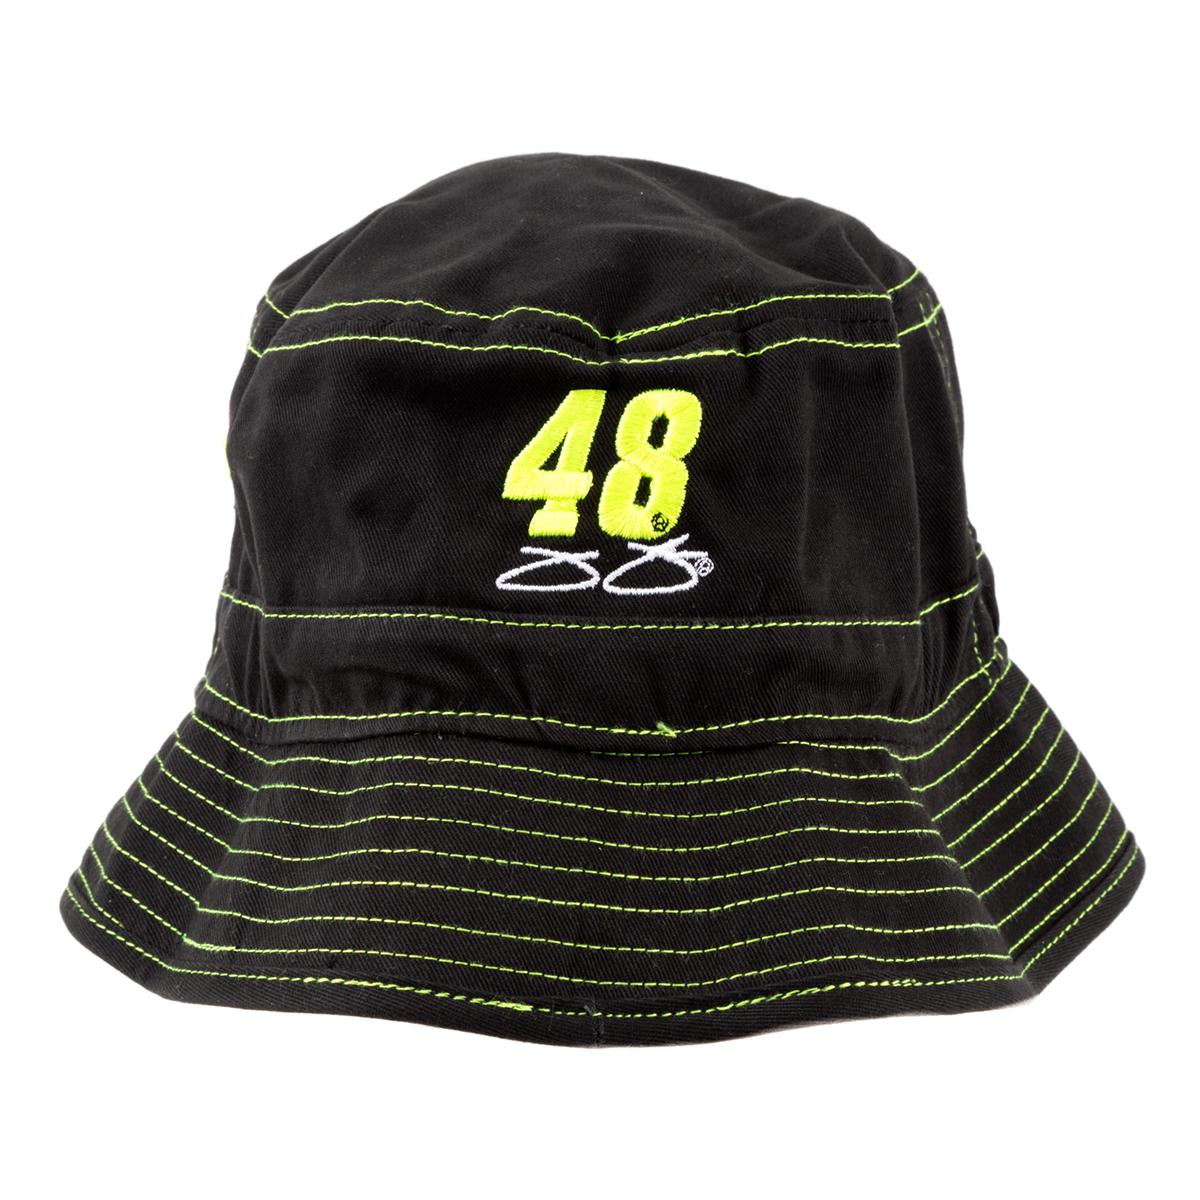 #48 Jimmie Johnson 2019 NASCAR Ally Black Bucket Hat